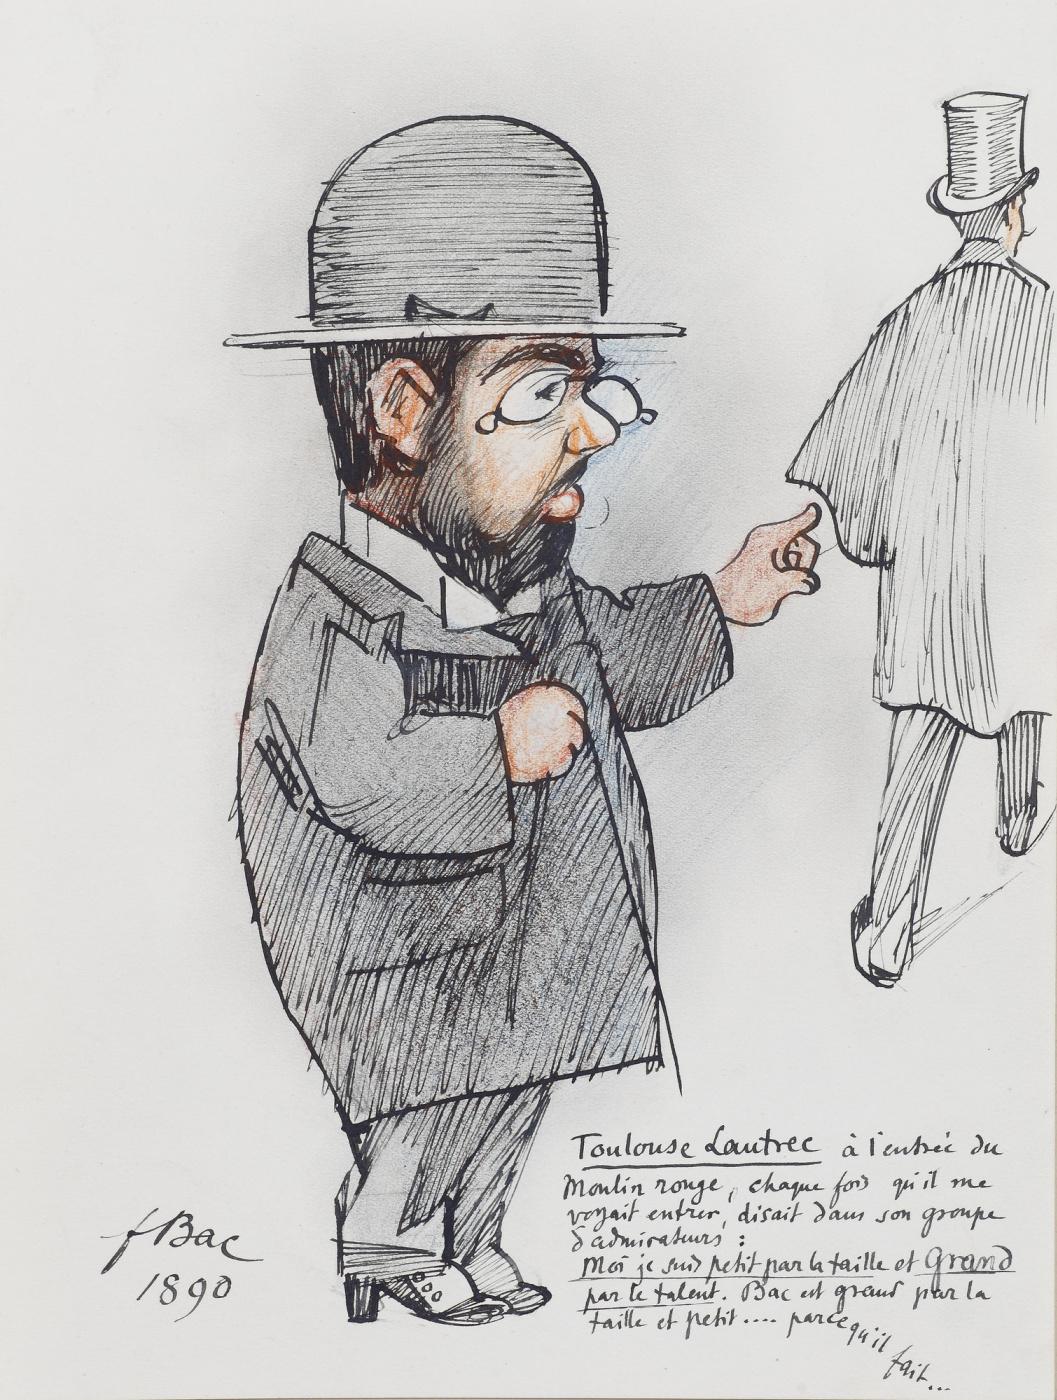 Ferdinand Buck. The caricature of Toulouse-Lautrec